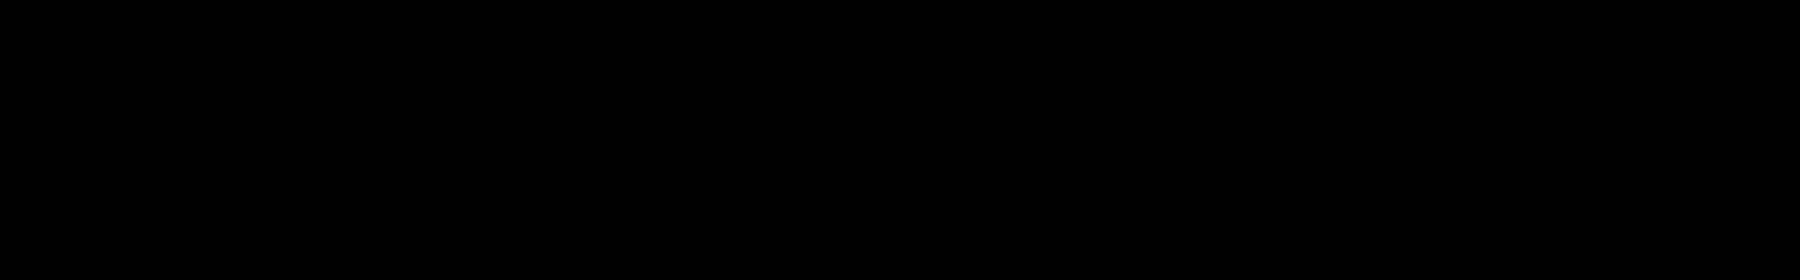 Emo Chill & Trap Bundle audio waveform